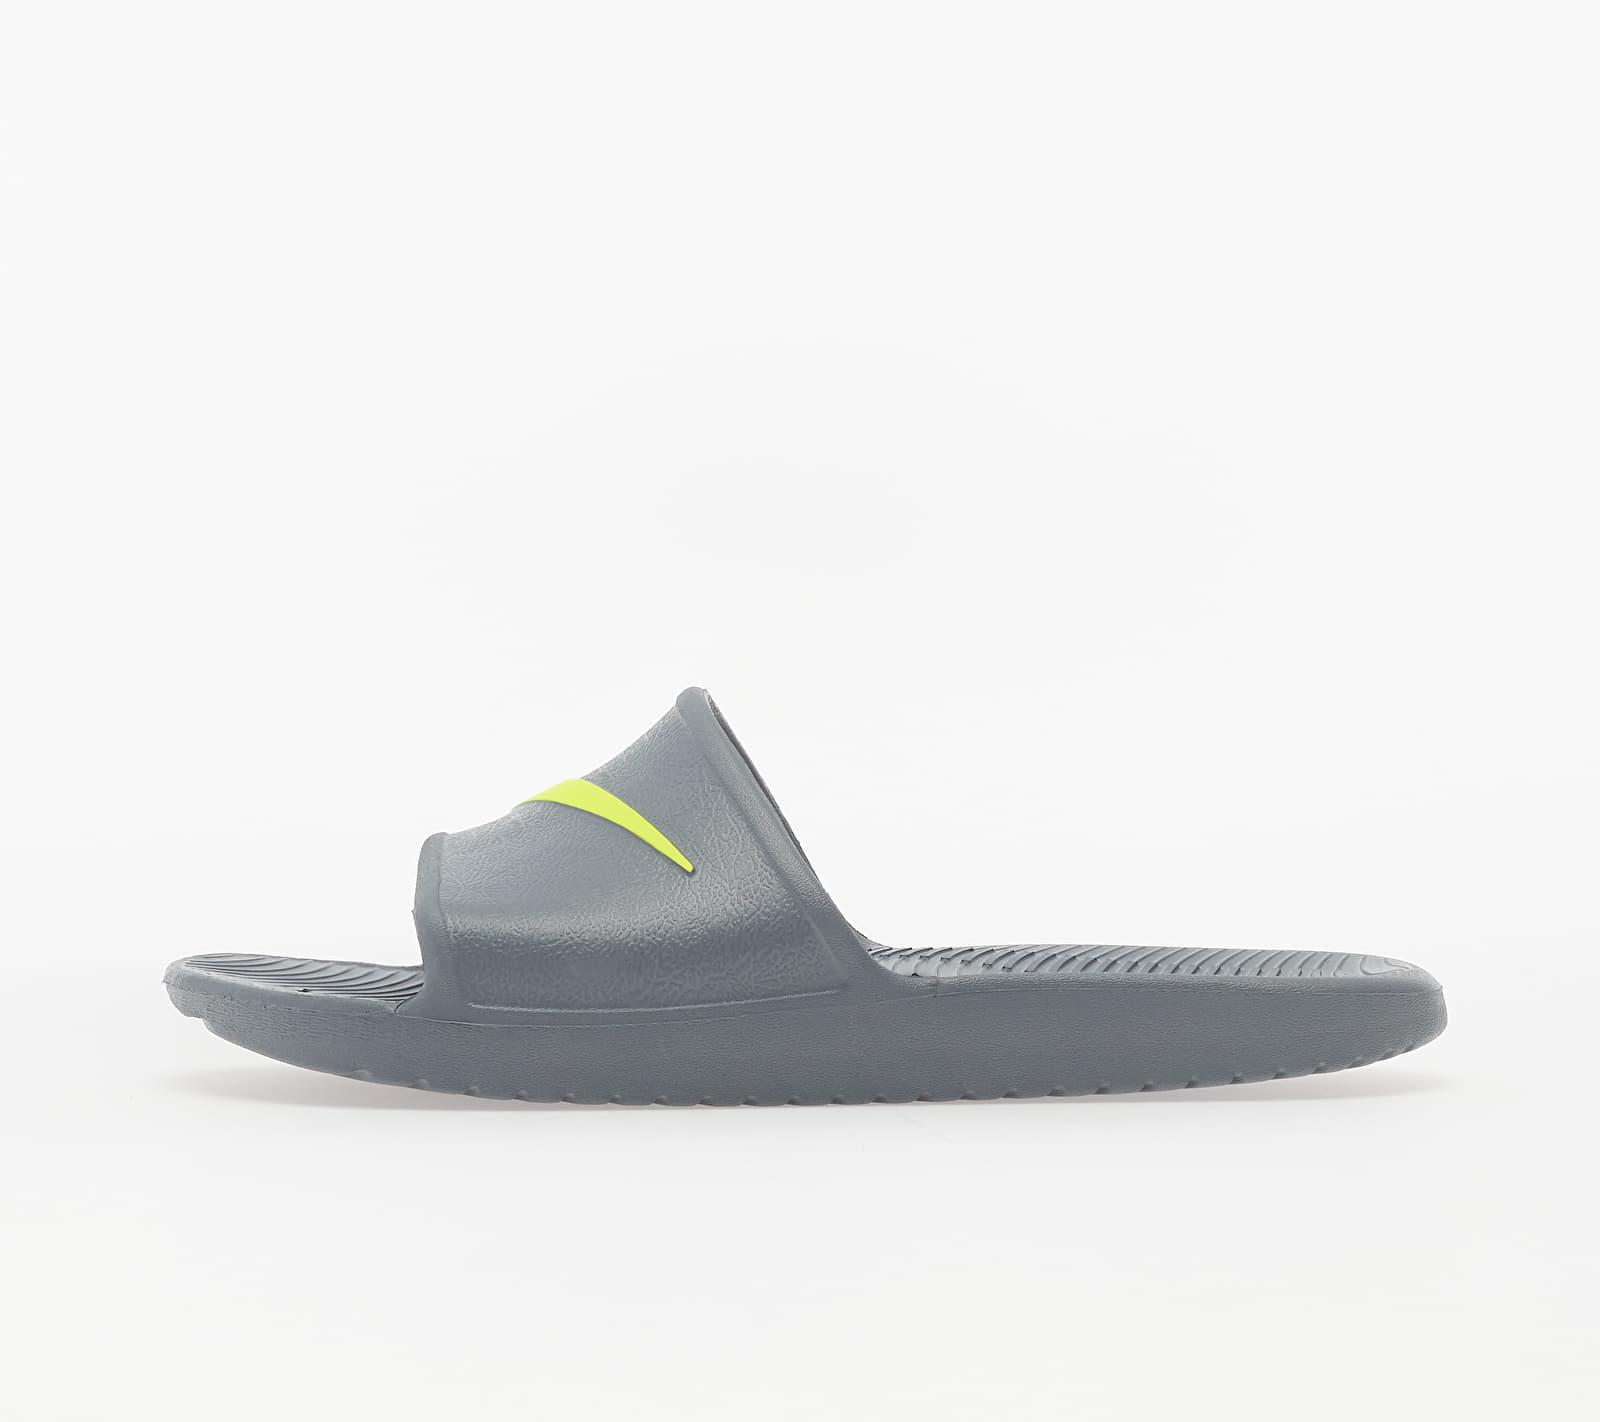 Nike Kawa Shower Cool Grey/ Volt EUR 38.5